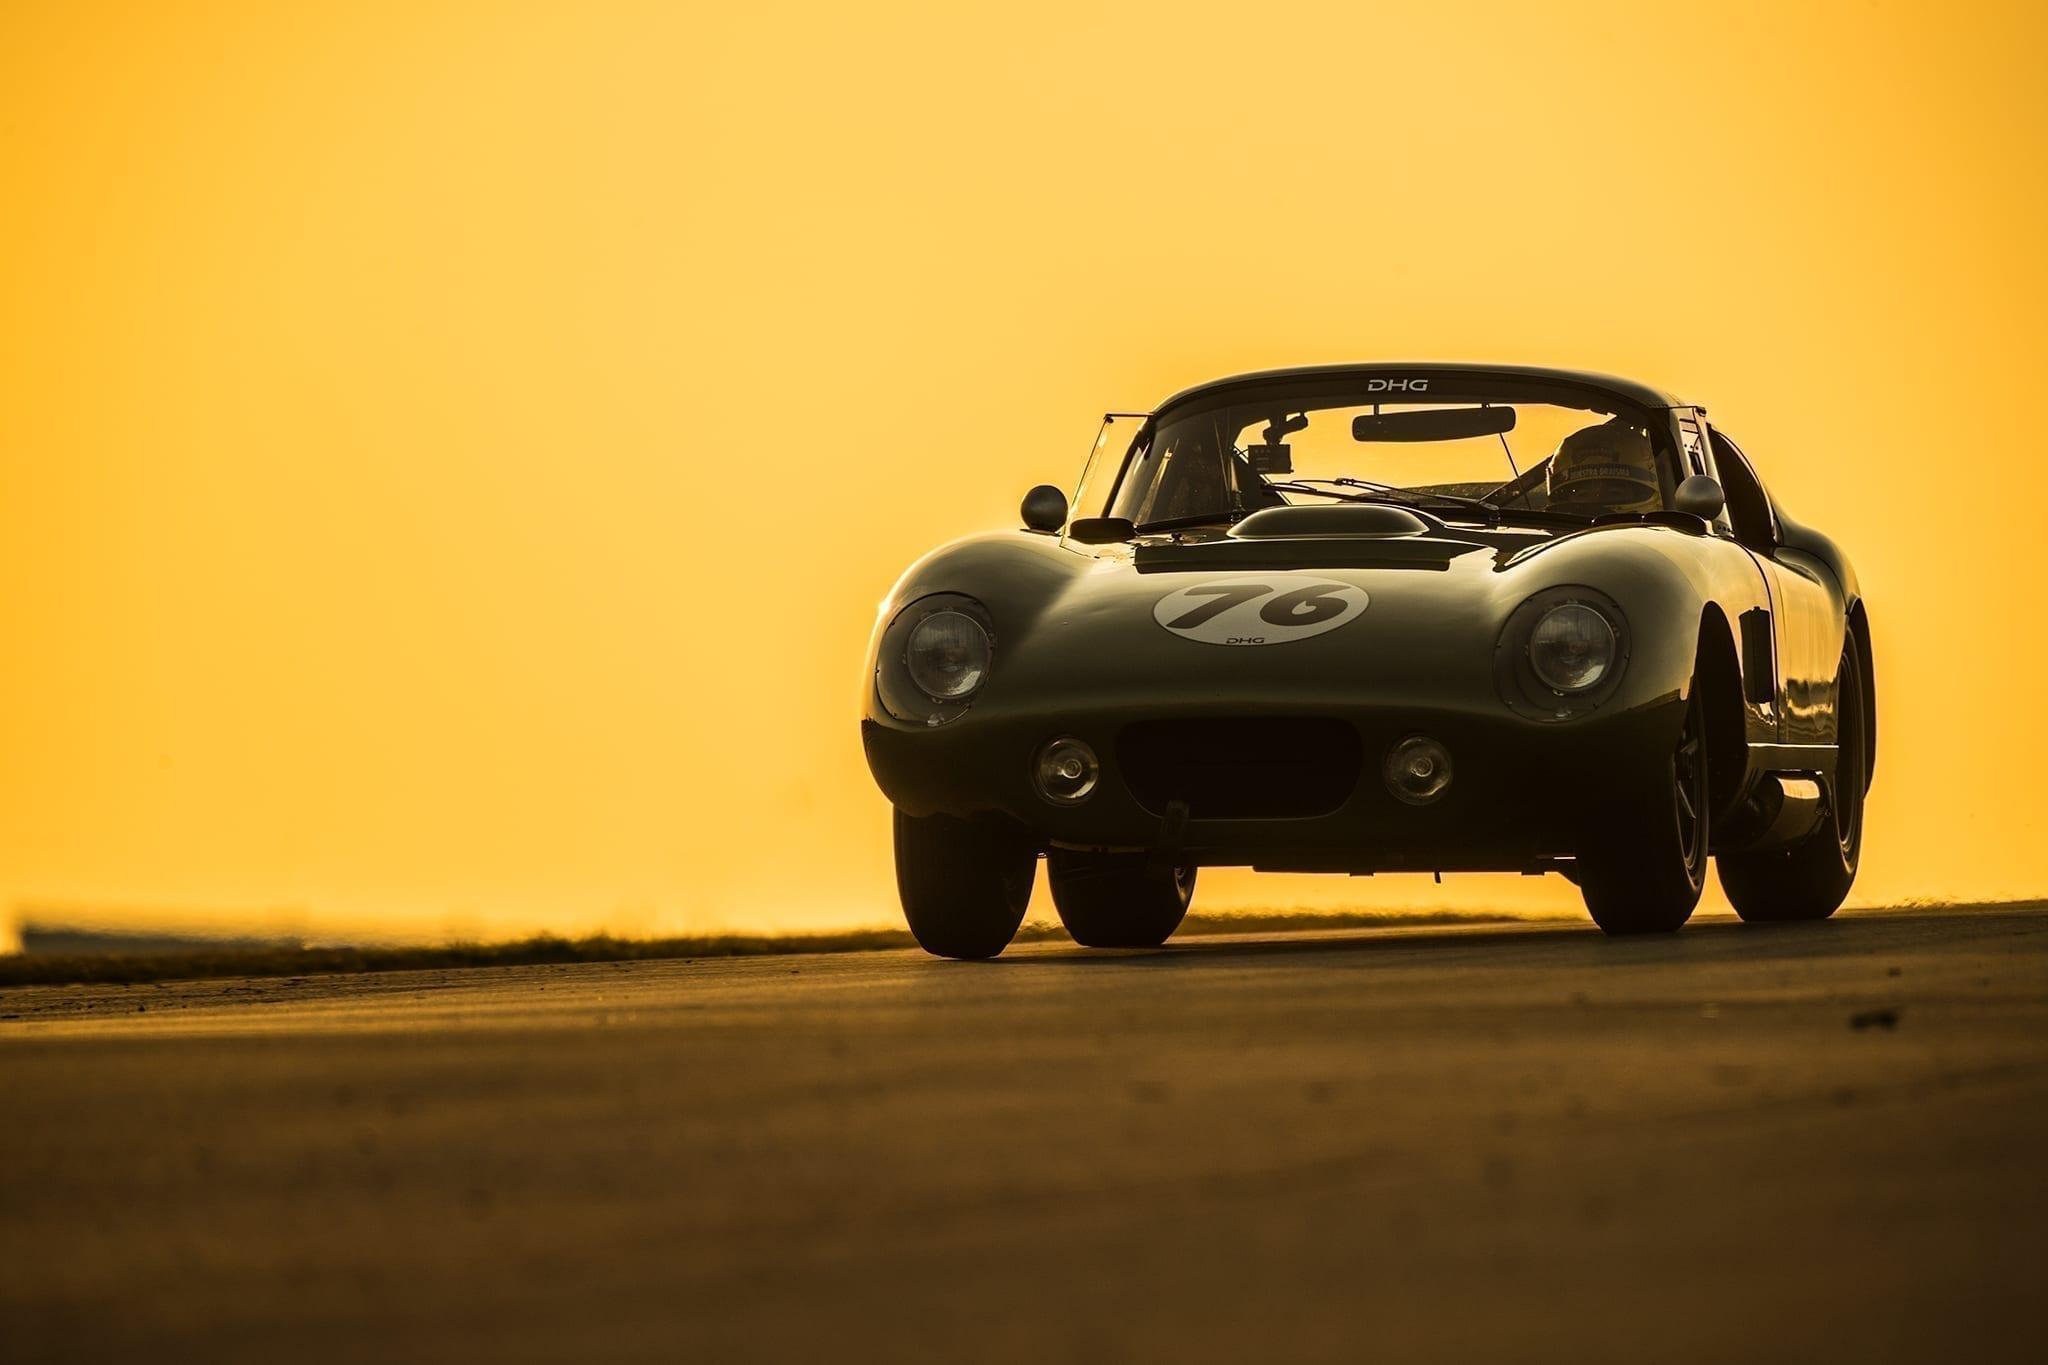 Tom Coronel testing the DHG Daytona Coupe